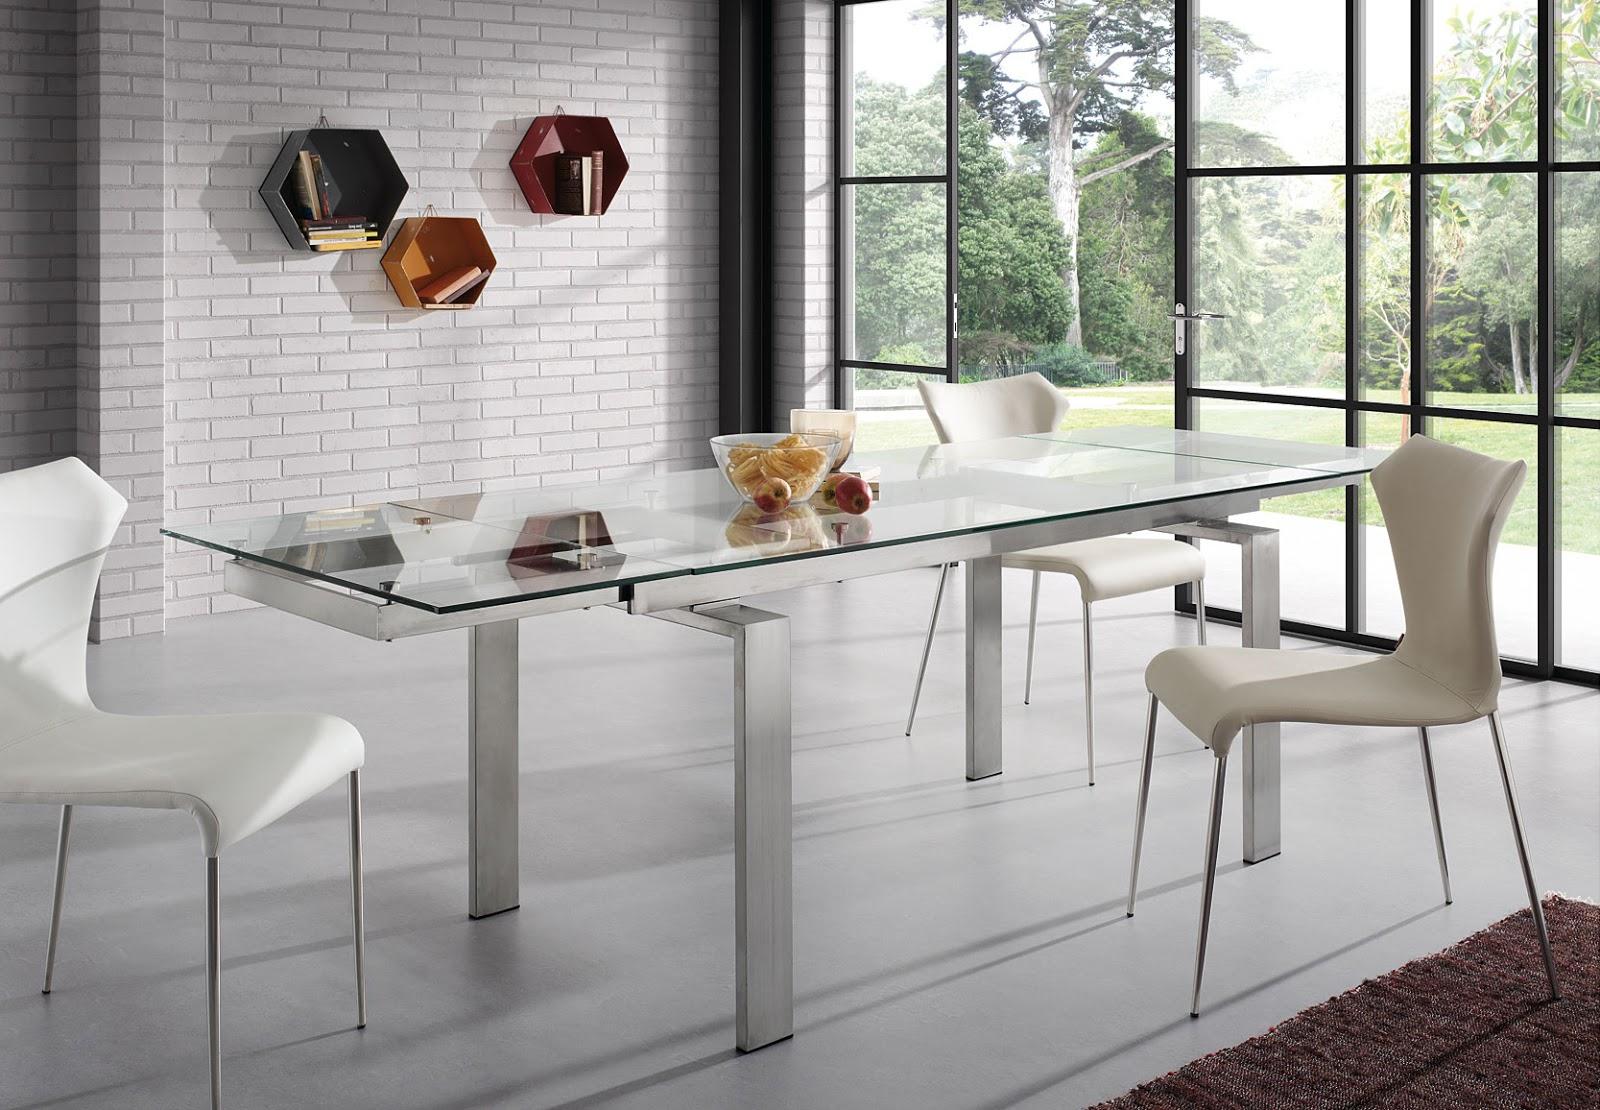 Mesas de comedor como decorar una mesa de comedor de cristal for Centros de mesa para comedor